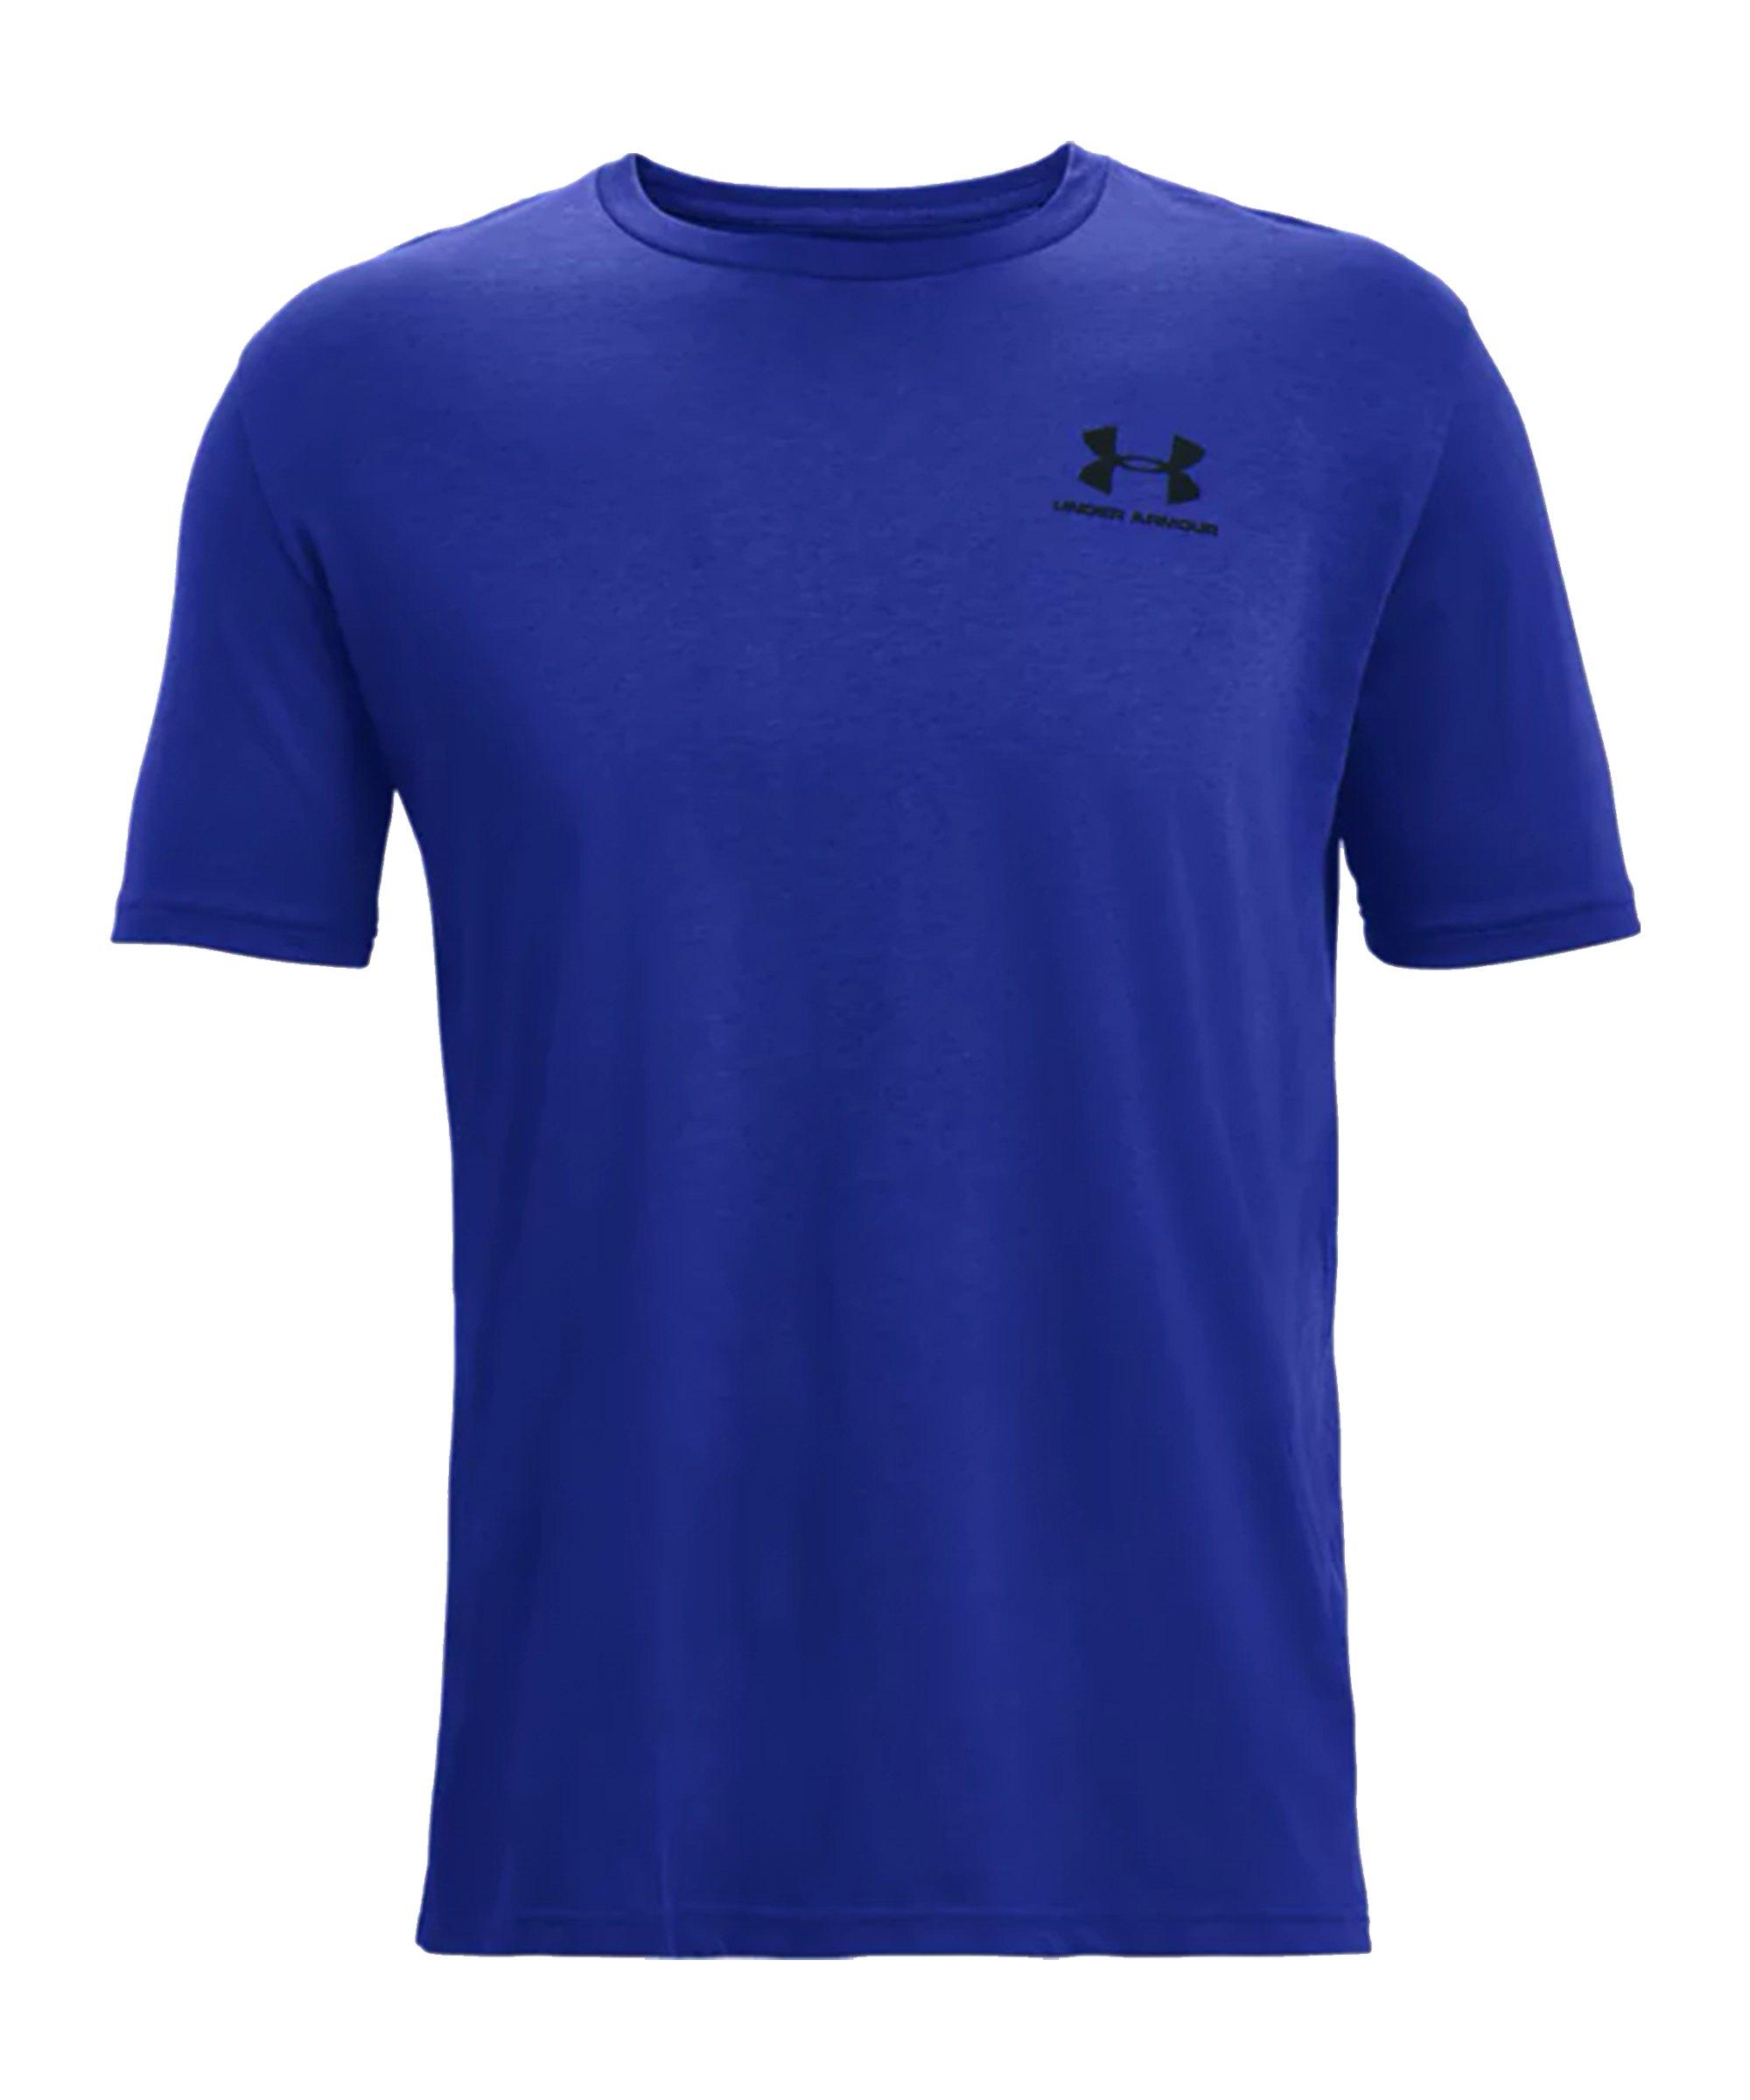 Under Armour Sportstyle Left Chest T-Shirt F402 - blau